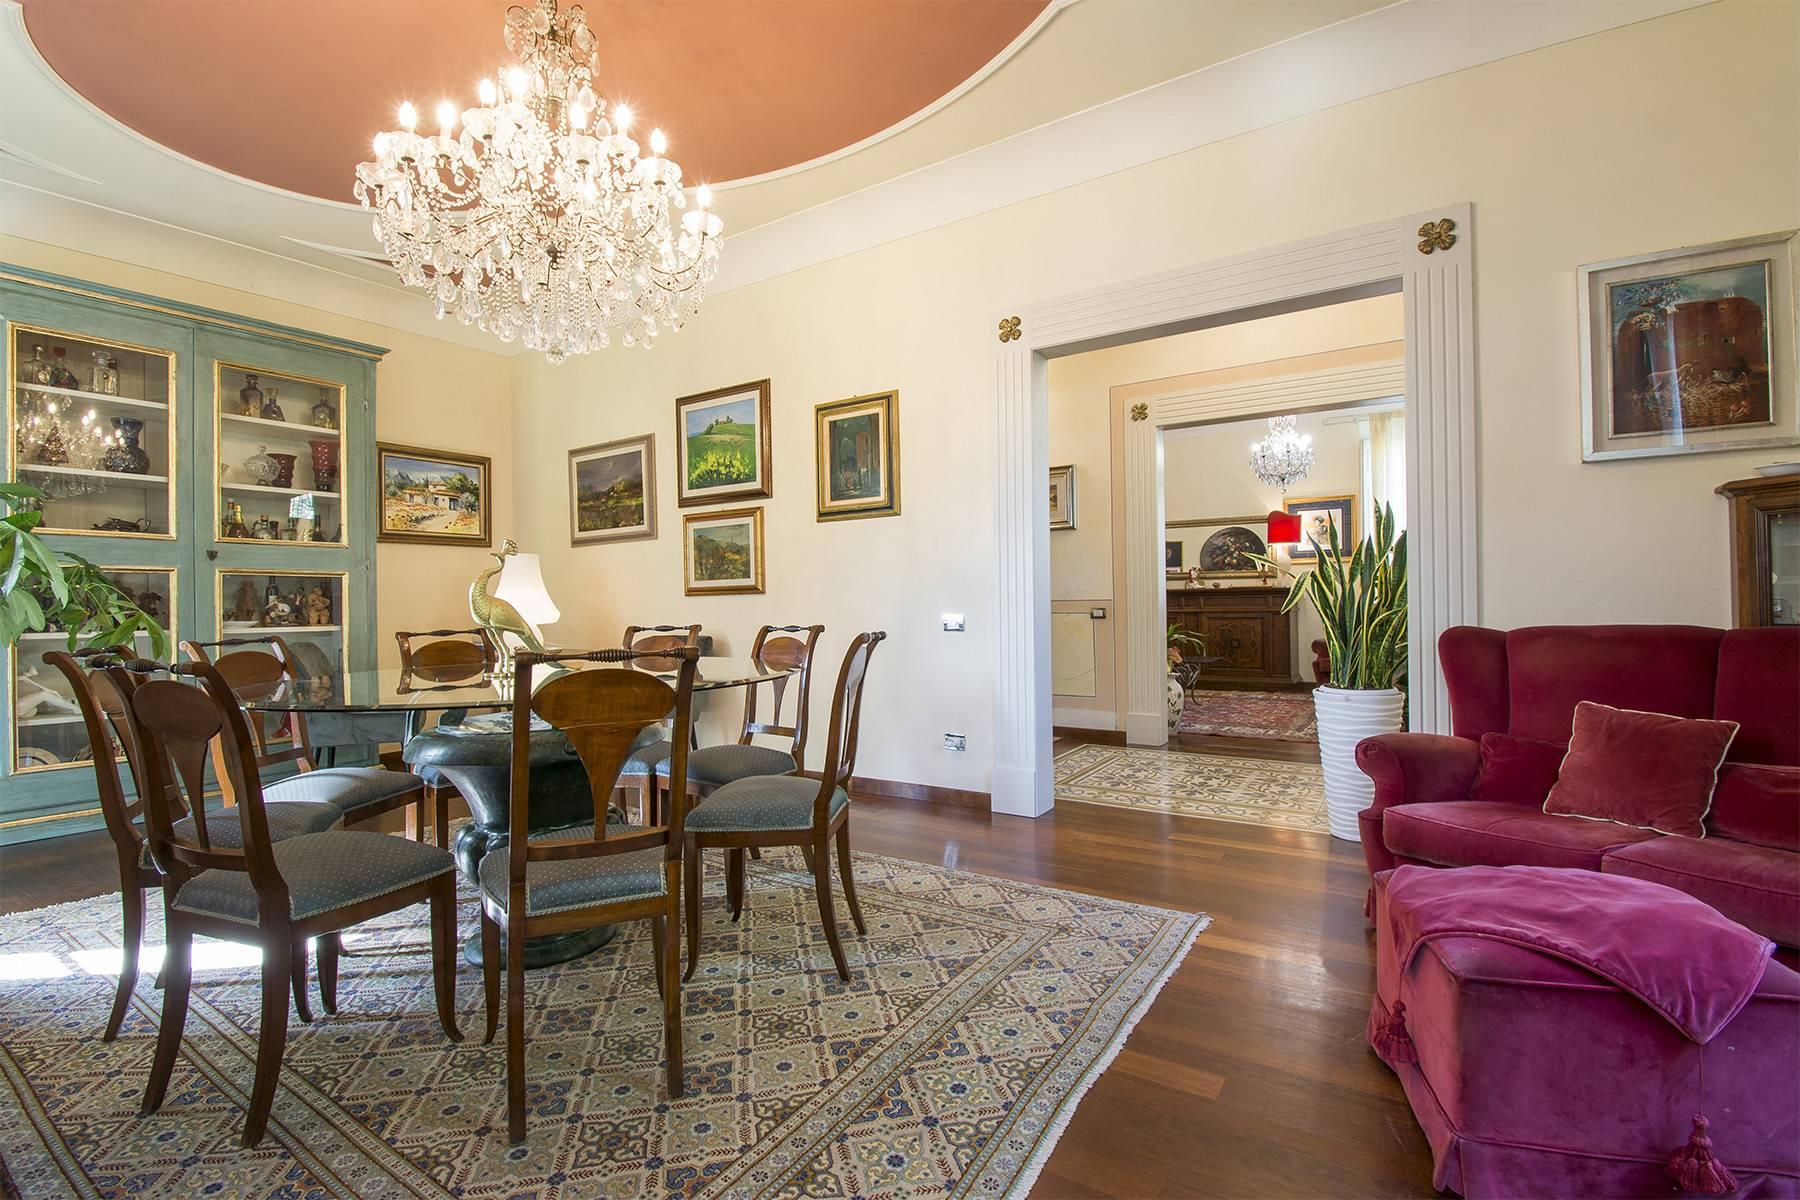 Villa in Vendita a Lucca: 5 locali, 350 mq - Foto 8